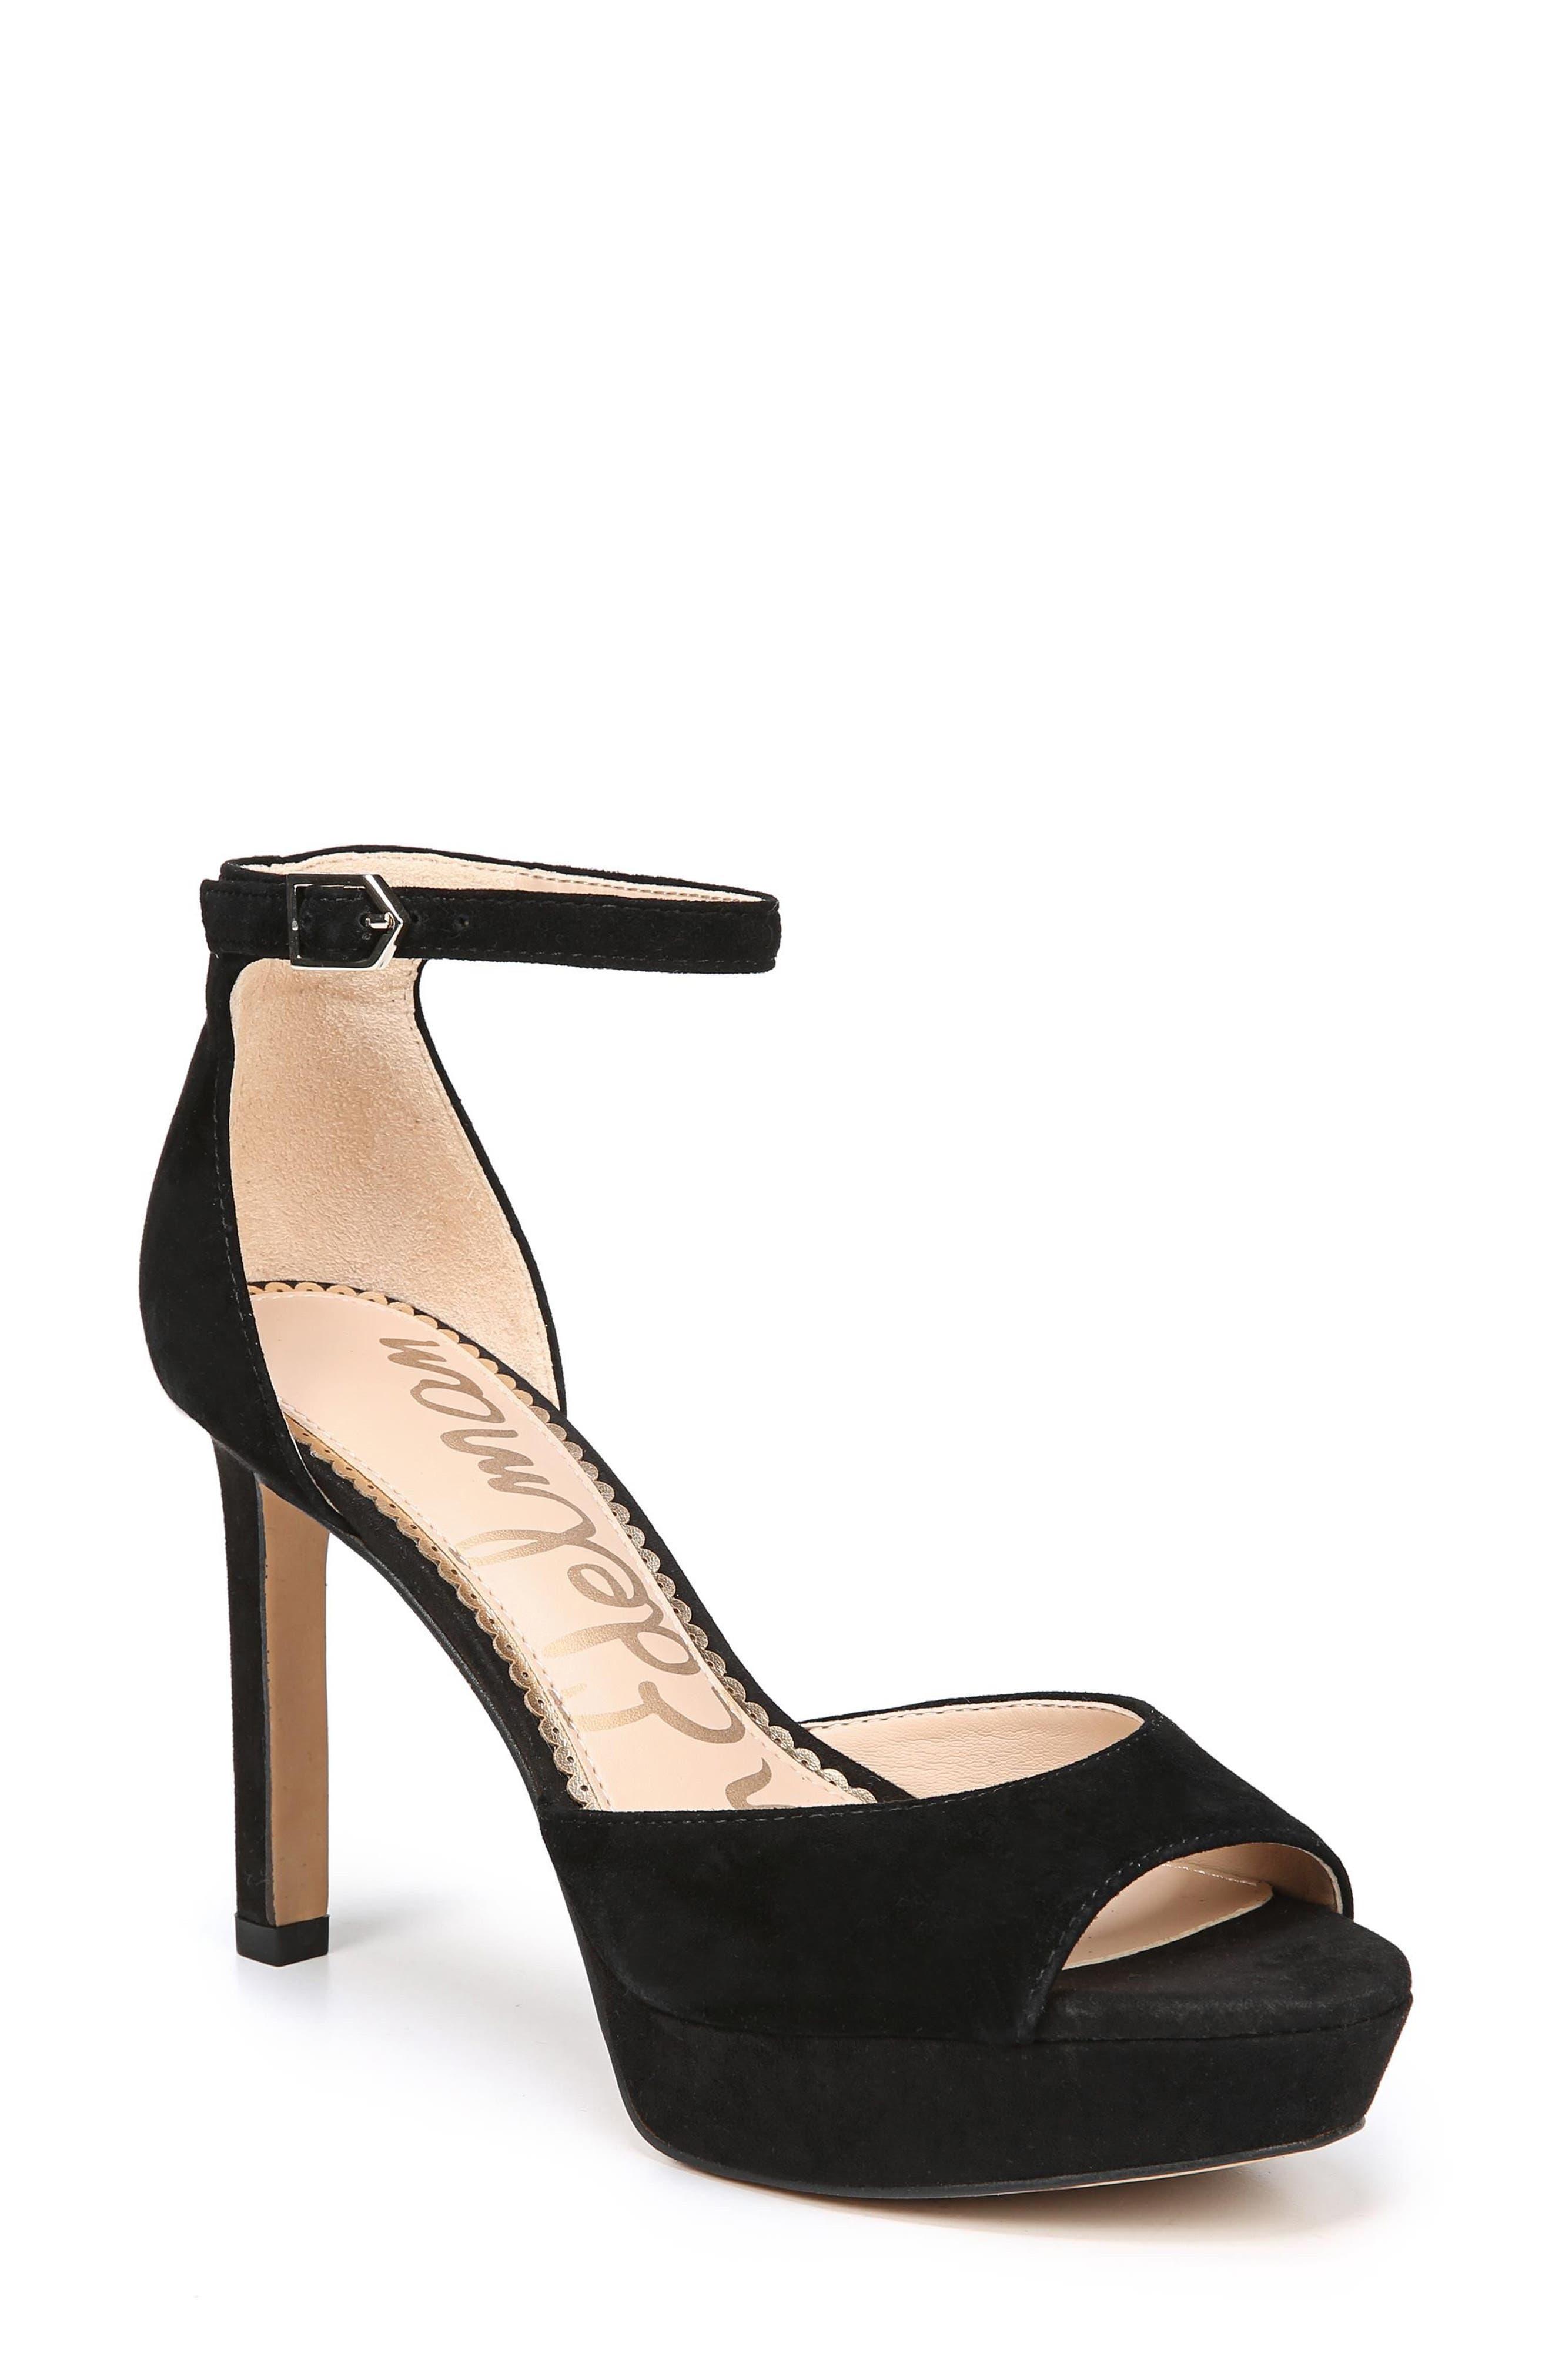 Jerin Platform Sandal,                             Main thumbnail 1, color,